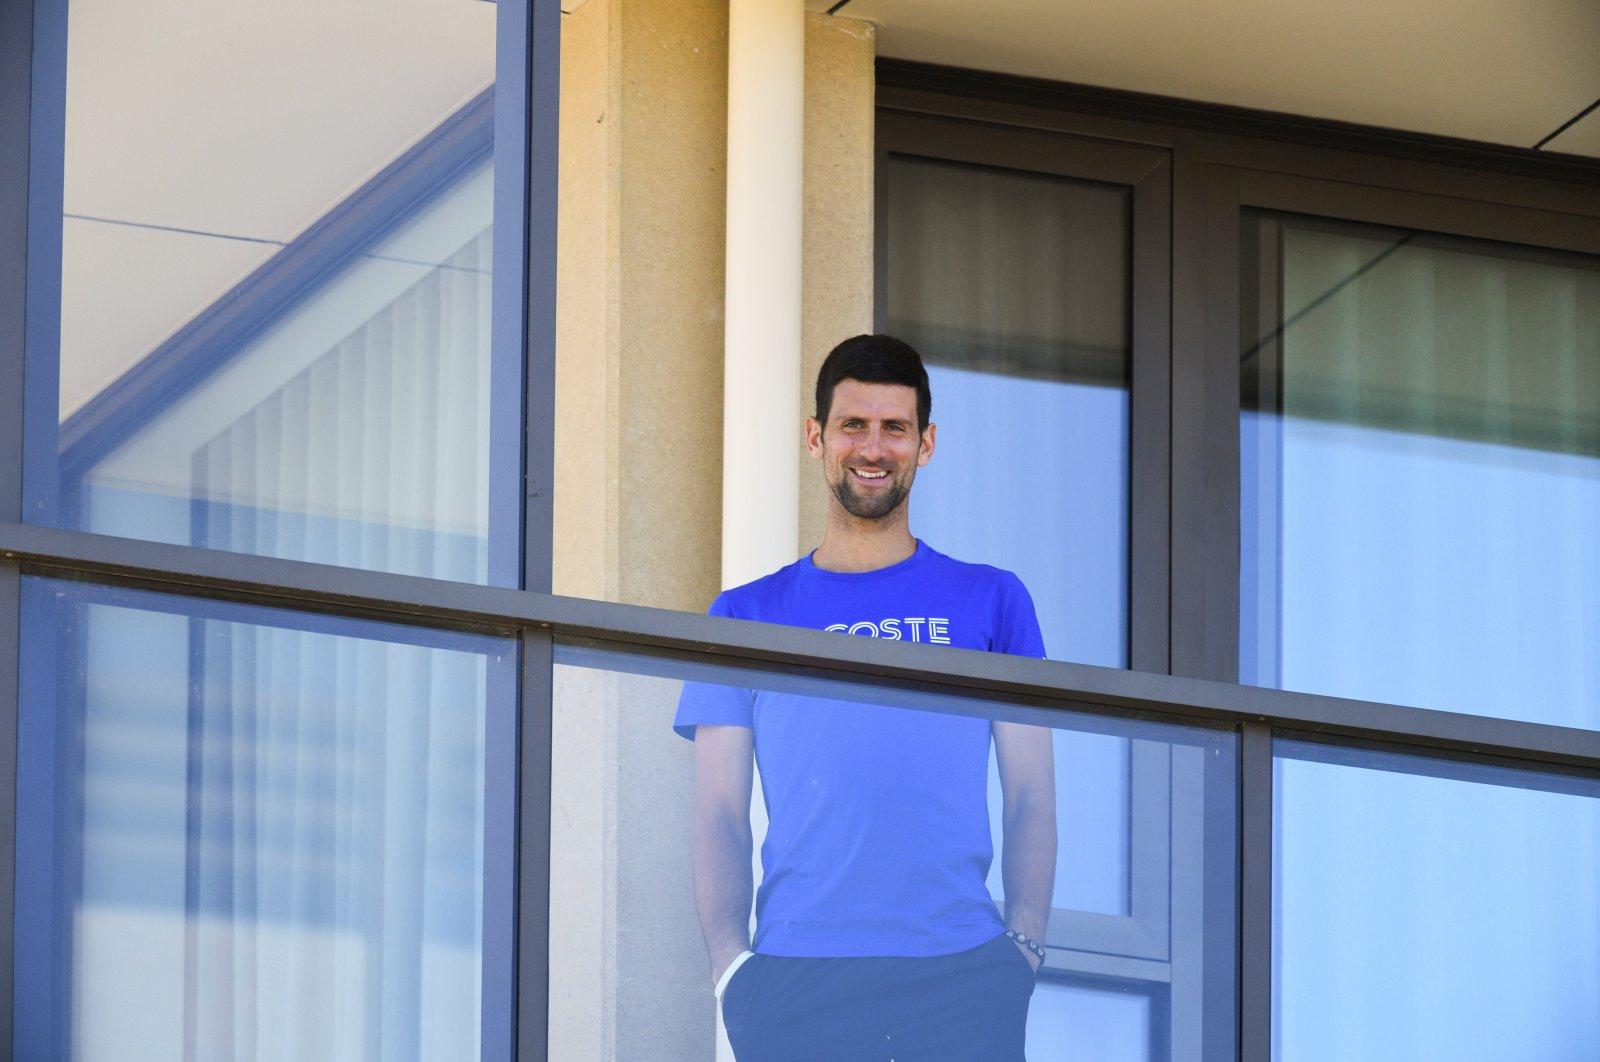 Novak Djokovic on the balcony of a hotel where tennis players are quarantining ahead of the Australian Open, Adelaide, Australia, Jan. 22, 2021. (REUTERS Photo)